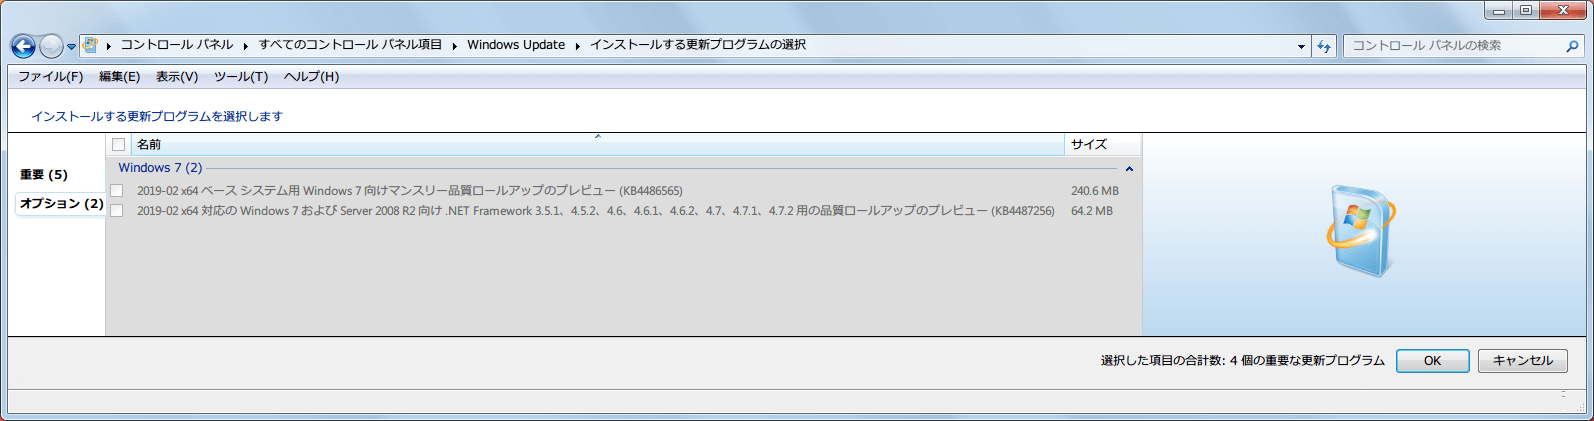 Windows 7 64bit Windows Update オプション 2019年2月分リスト KB4486565、KB4487256 非表示